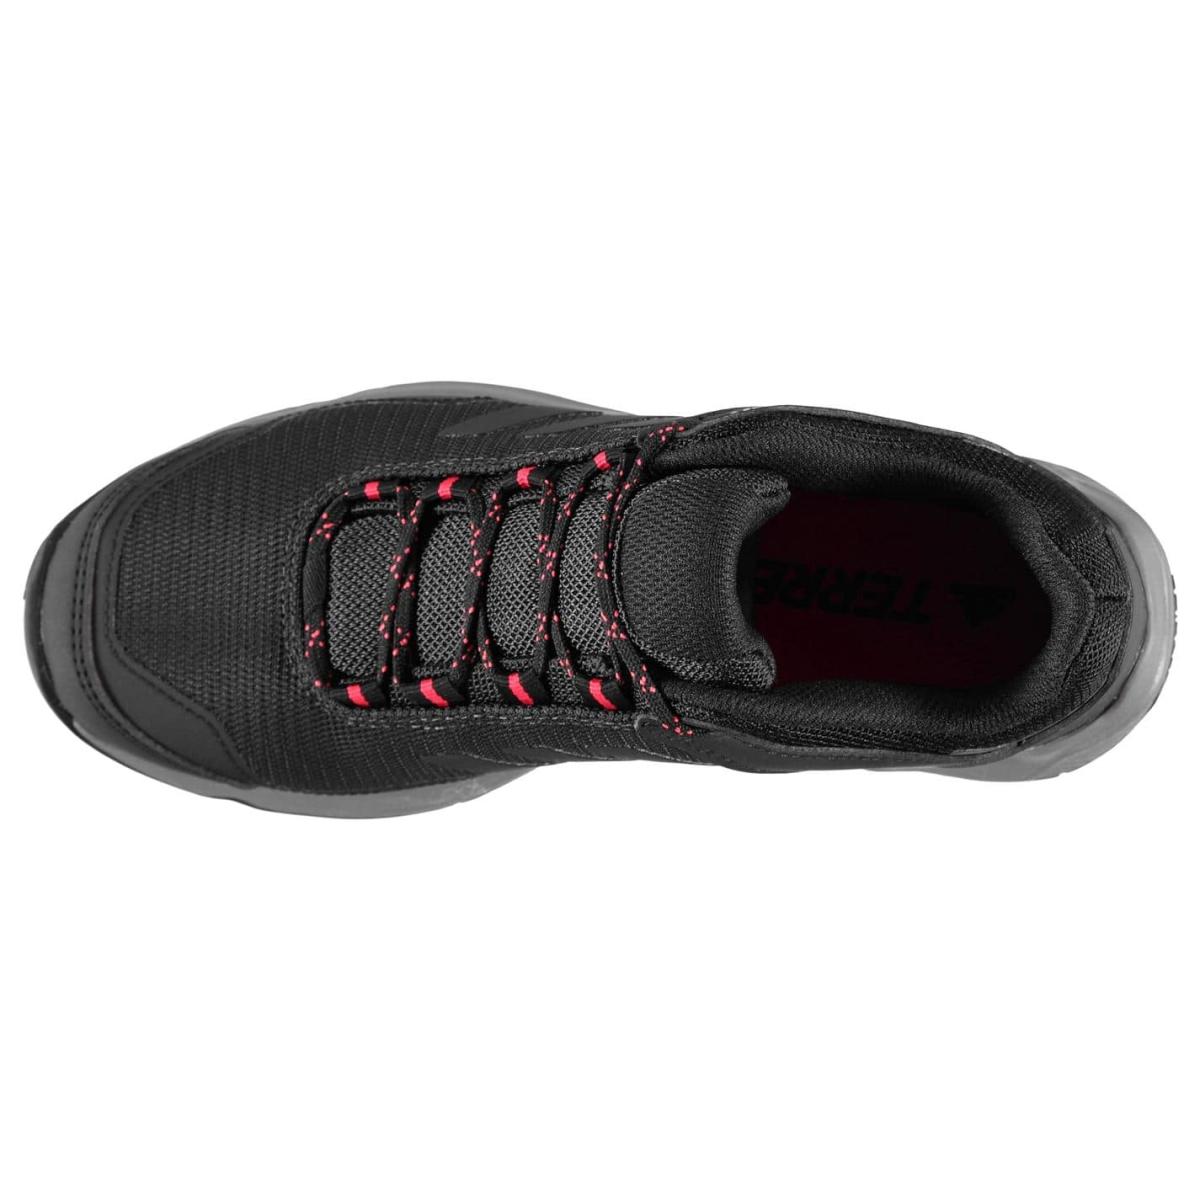 adidas-Terrex-Turnschuhe-Damen-Sneaker-Sportschuhe-Laufschuhe-7008 Indexbild 4